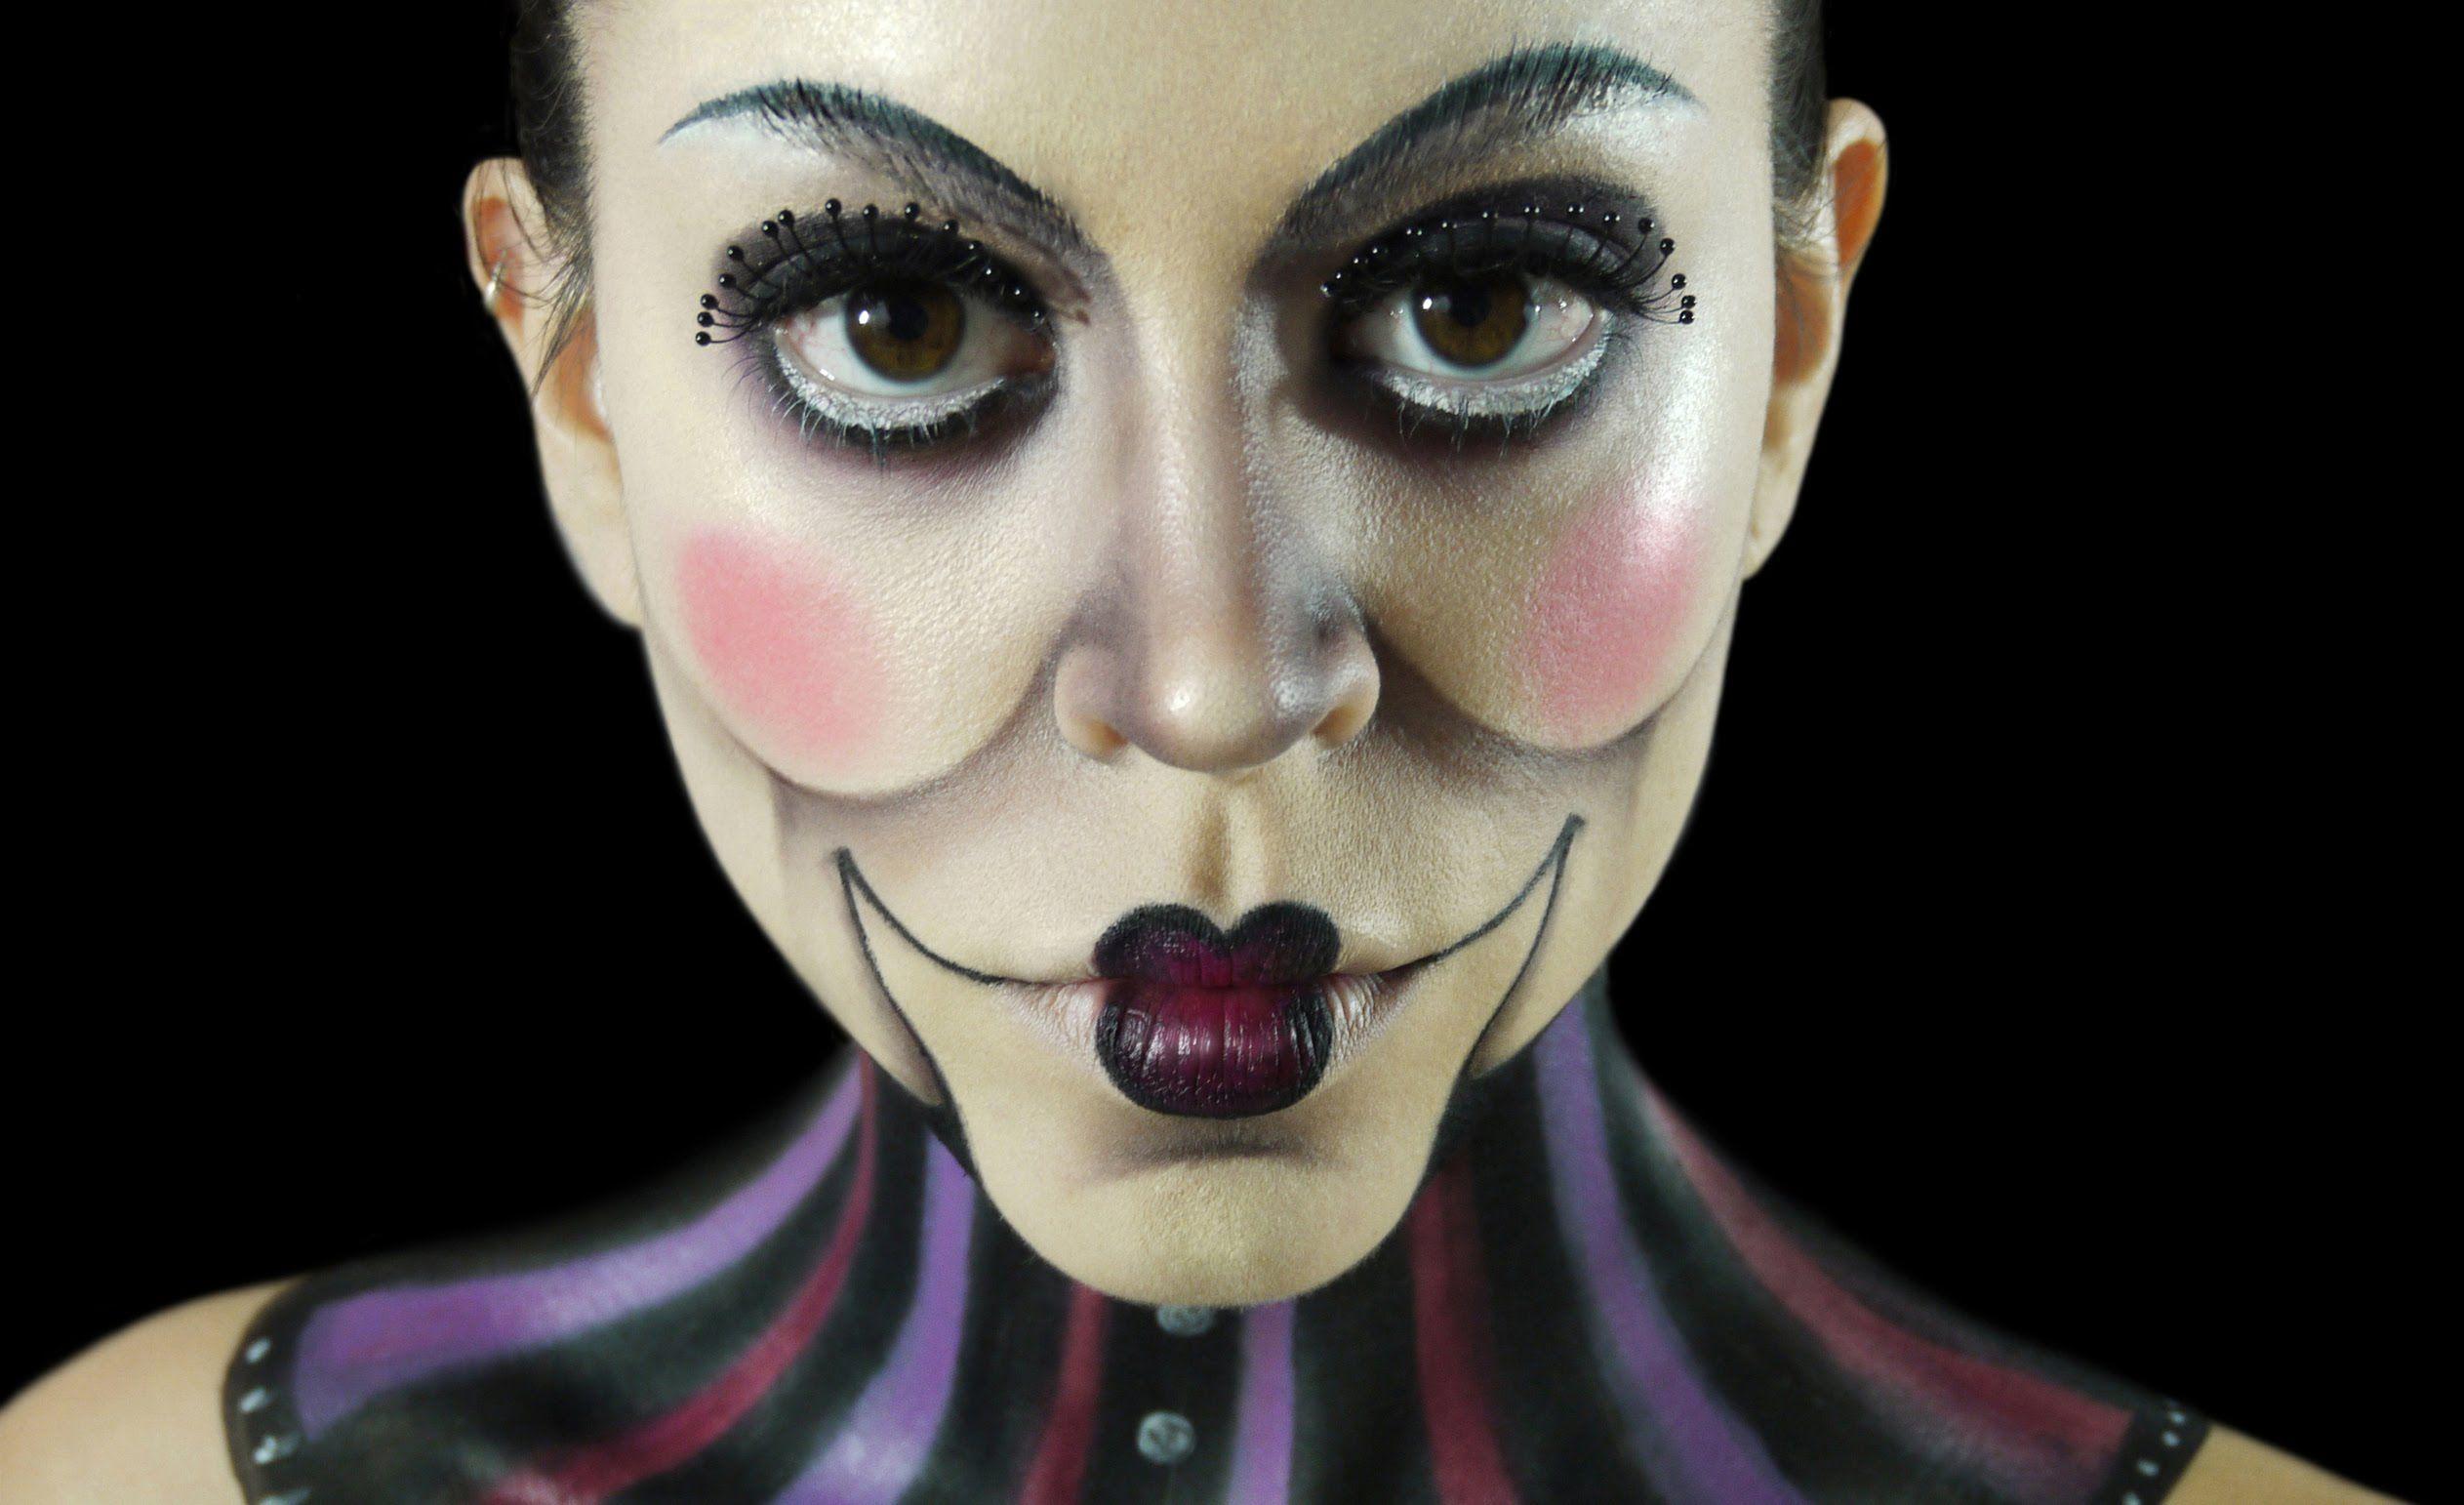 Ventriloquist Dummy Makeup Tutorial Claire Dim Halloween Costumes Makeup Zombie Makeup Tutorials Scary Makeup